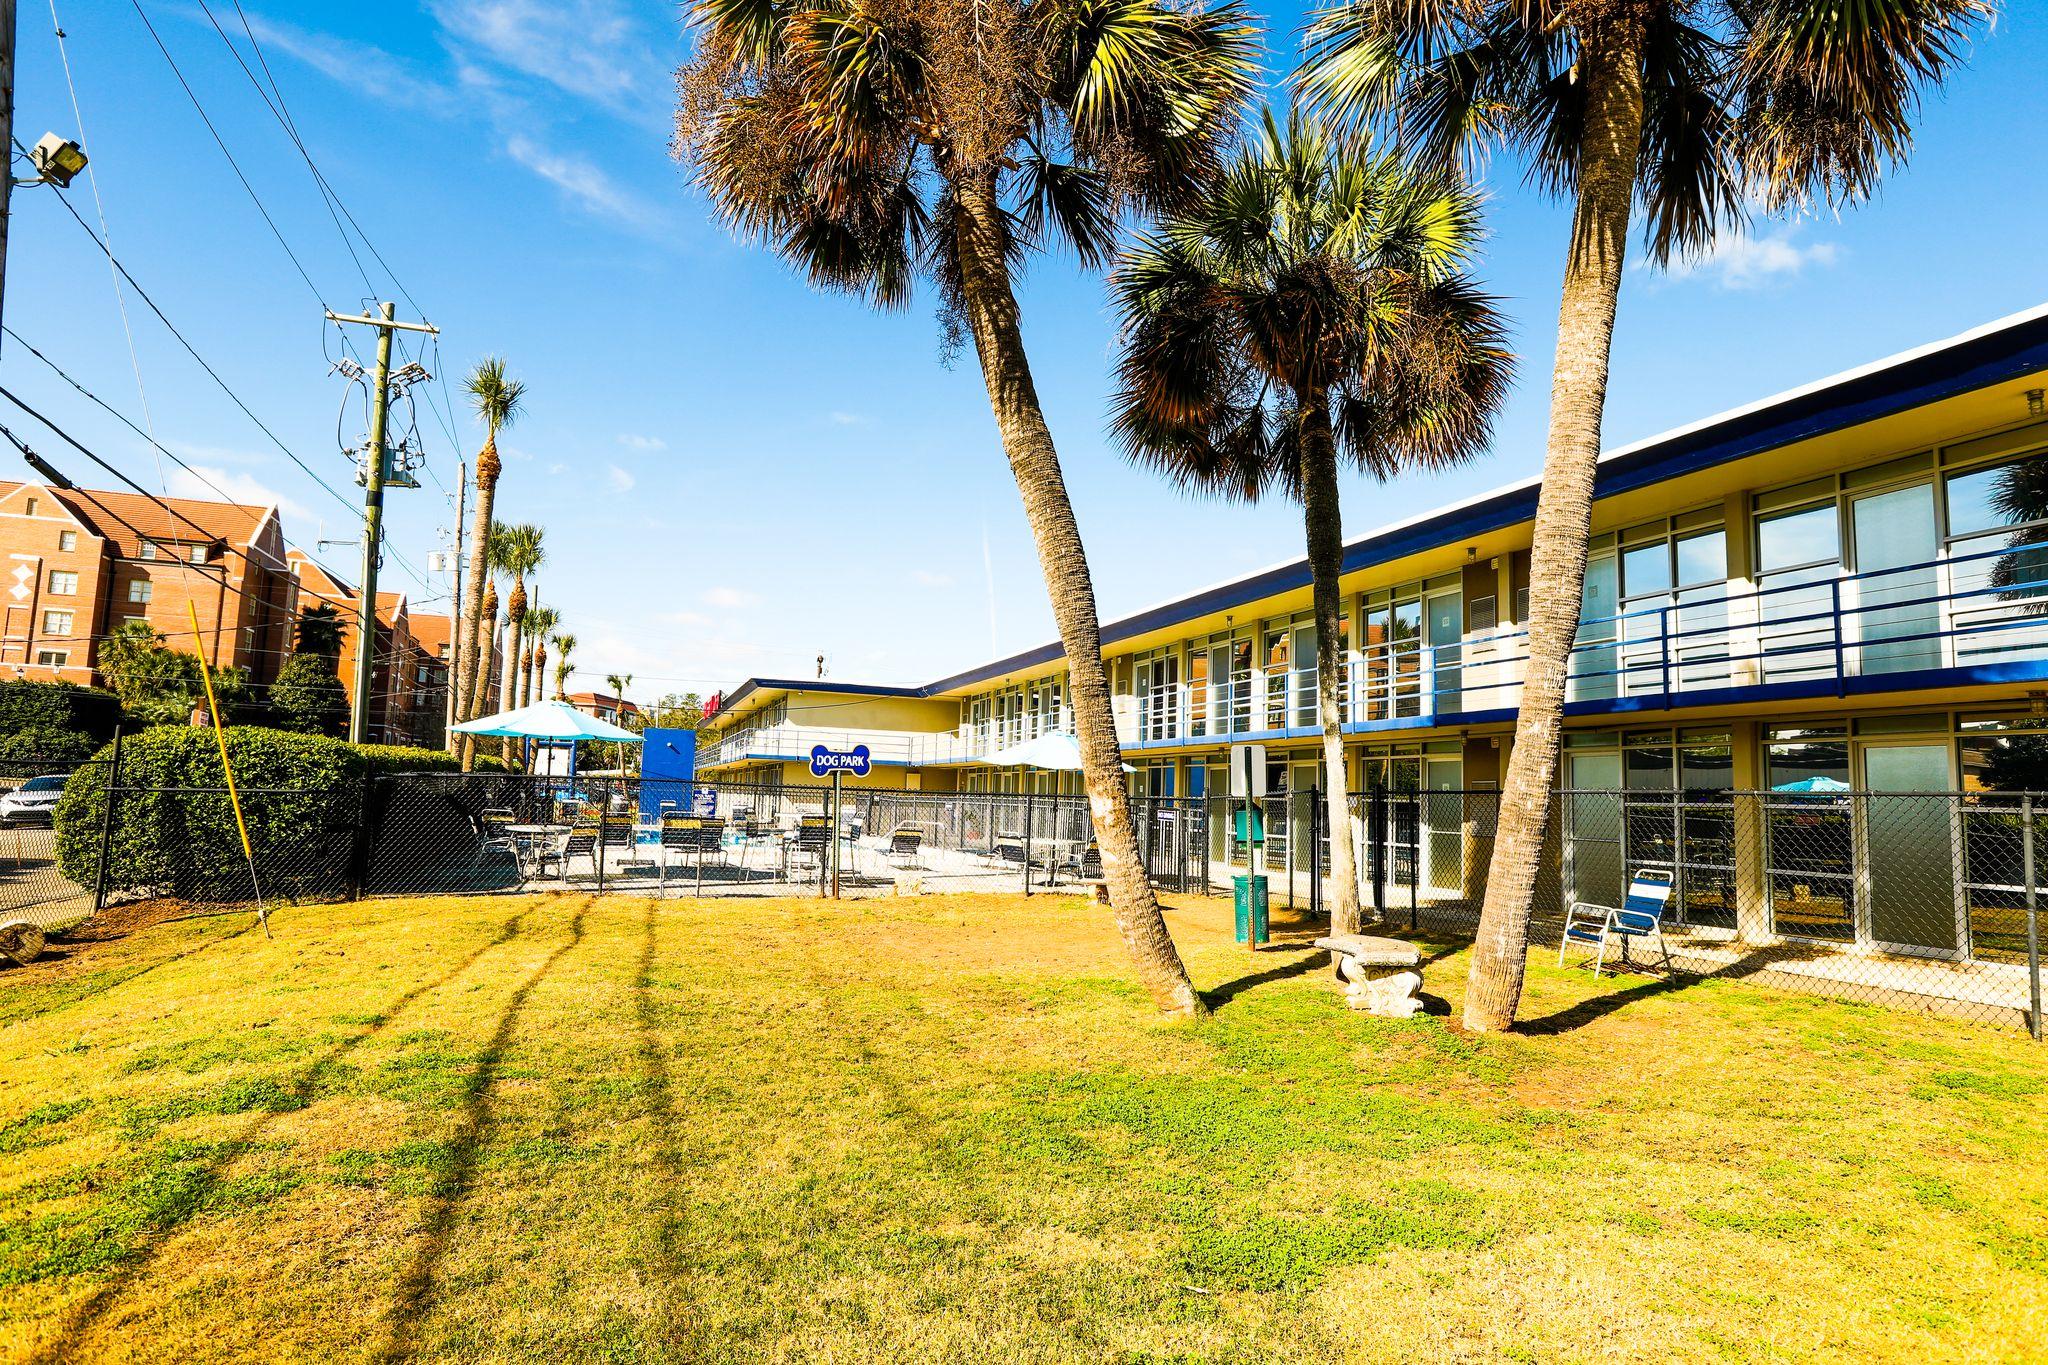 University Lofts